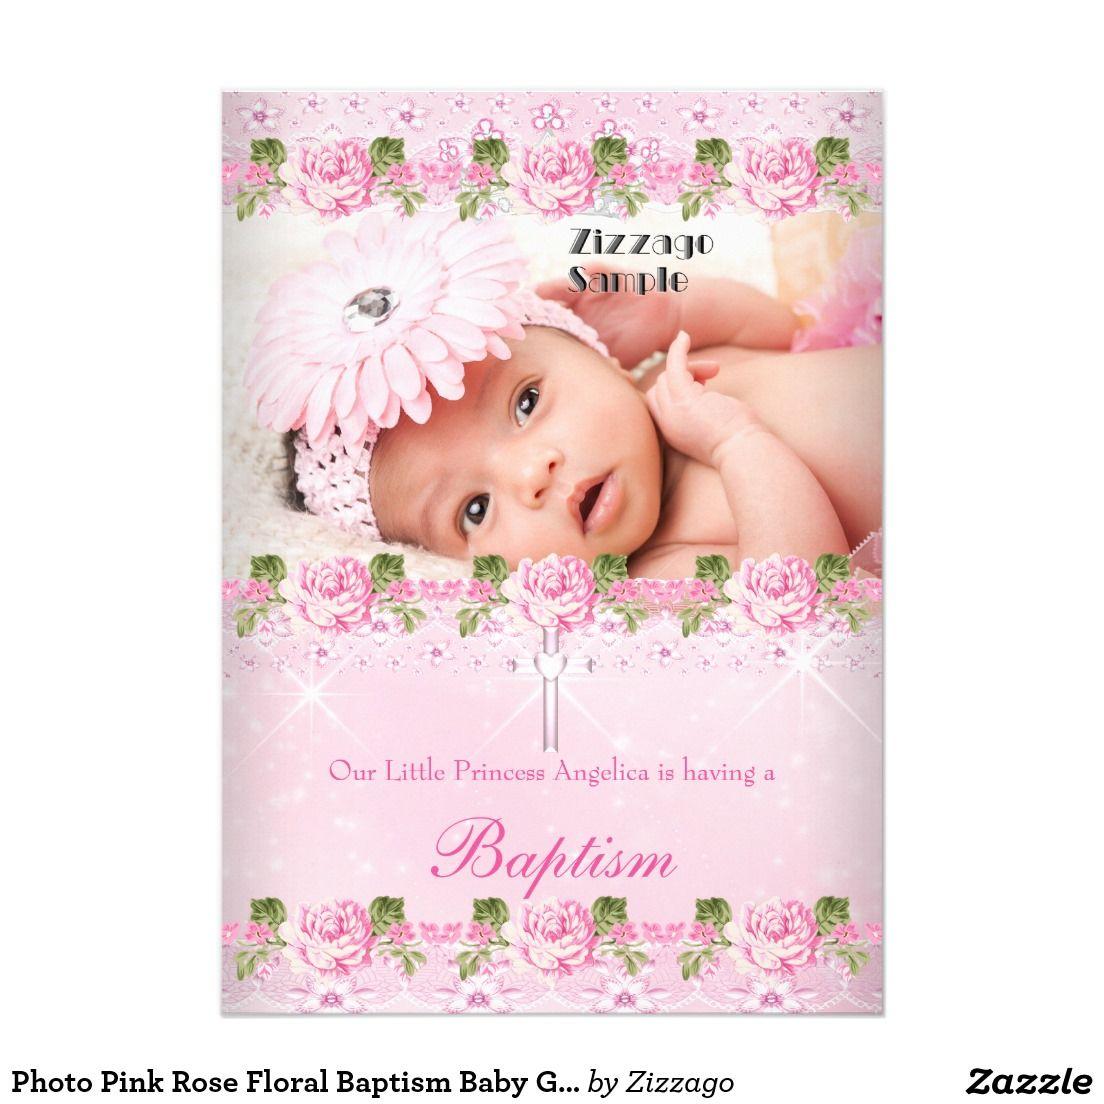 Photo Pink Rose Floral Baptism Baby Girl Invitation Zazzle